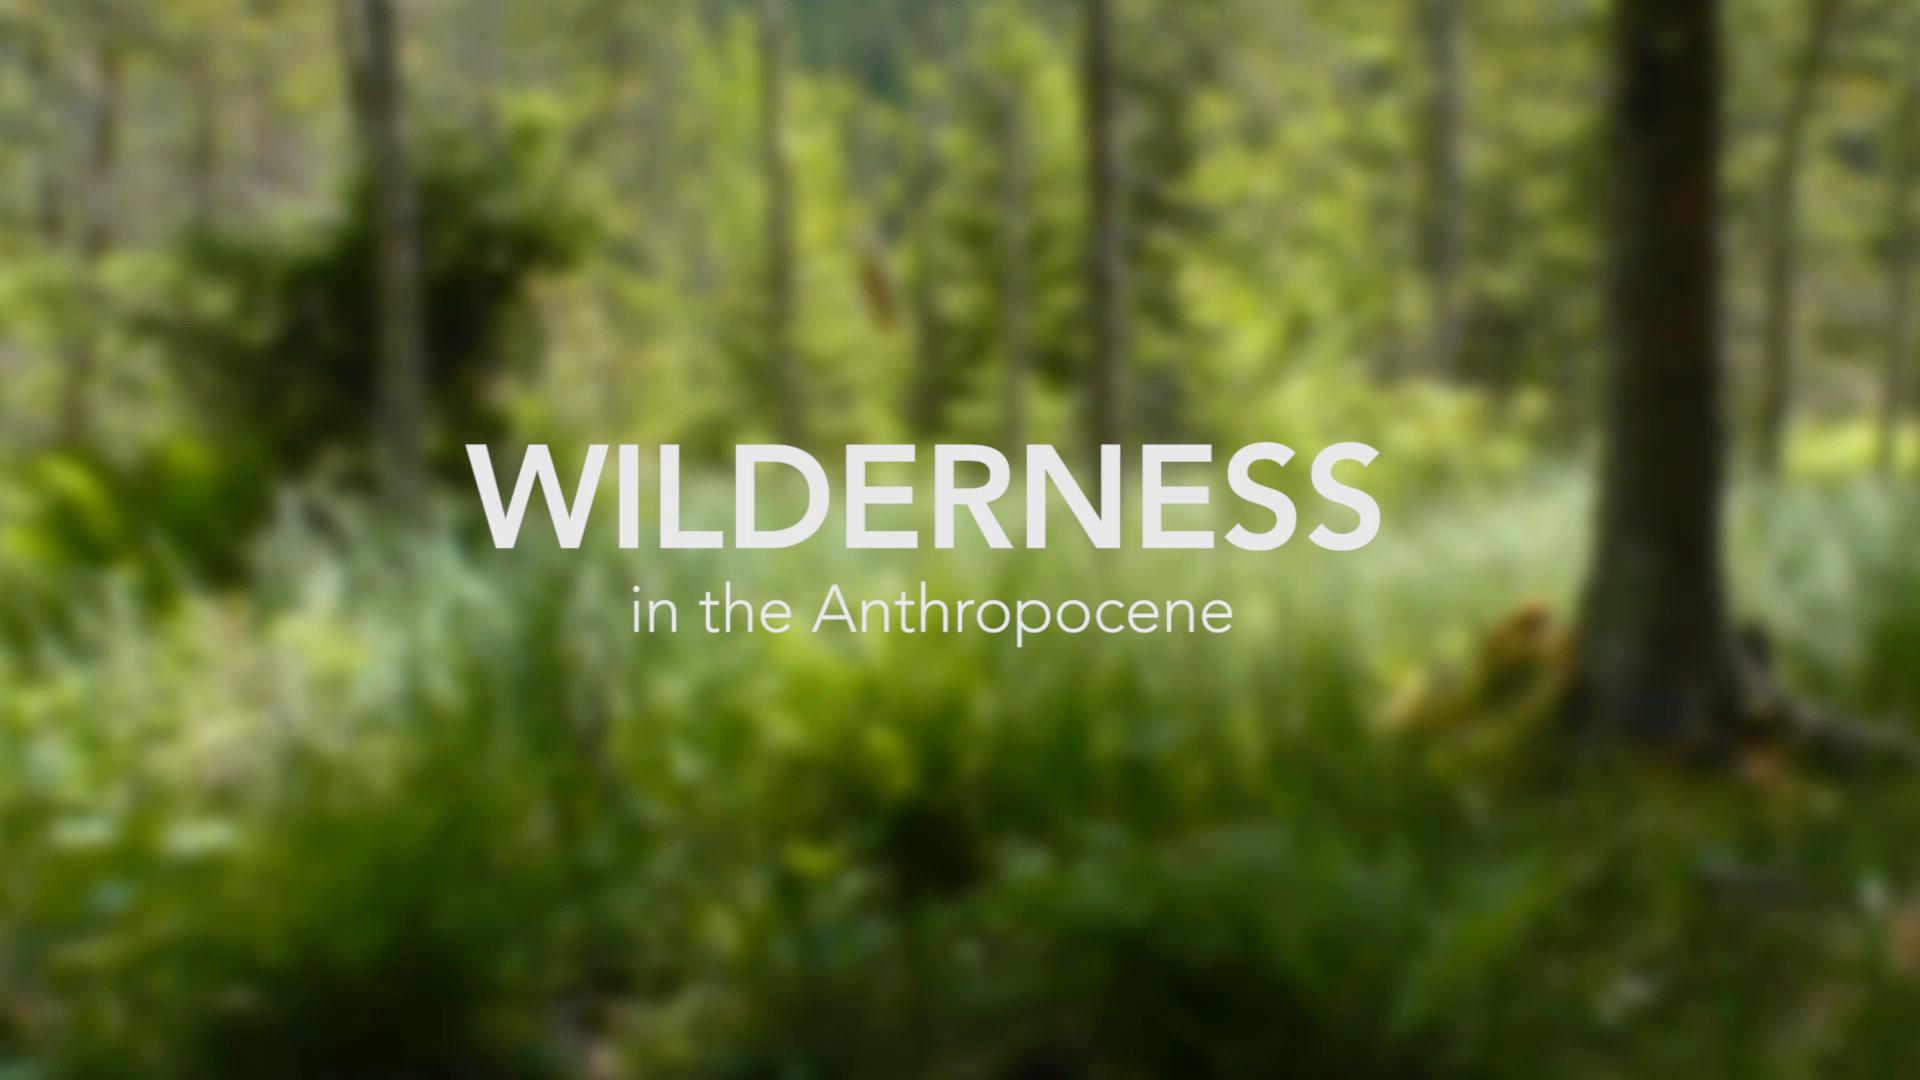 WILDERNESS-Maxlackner.016.jpeg